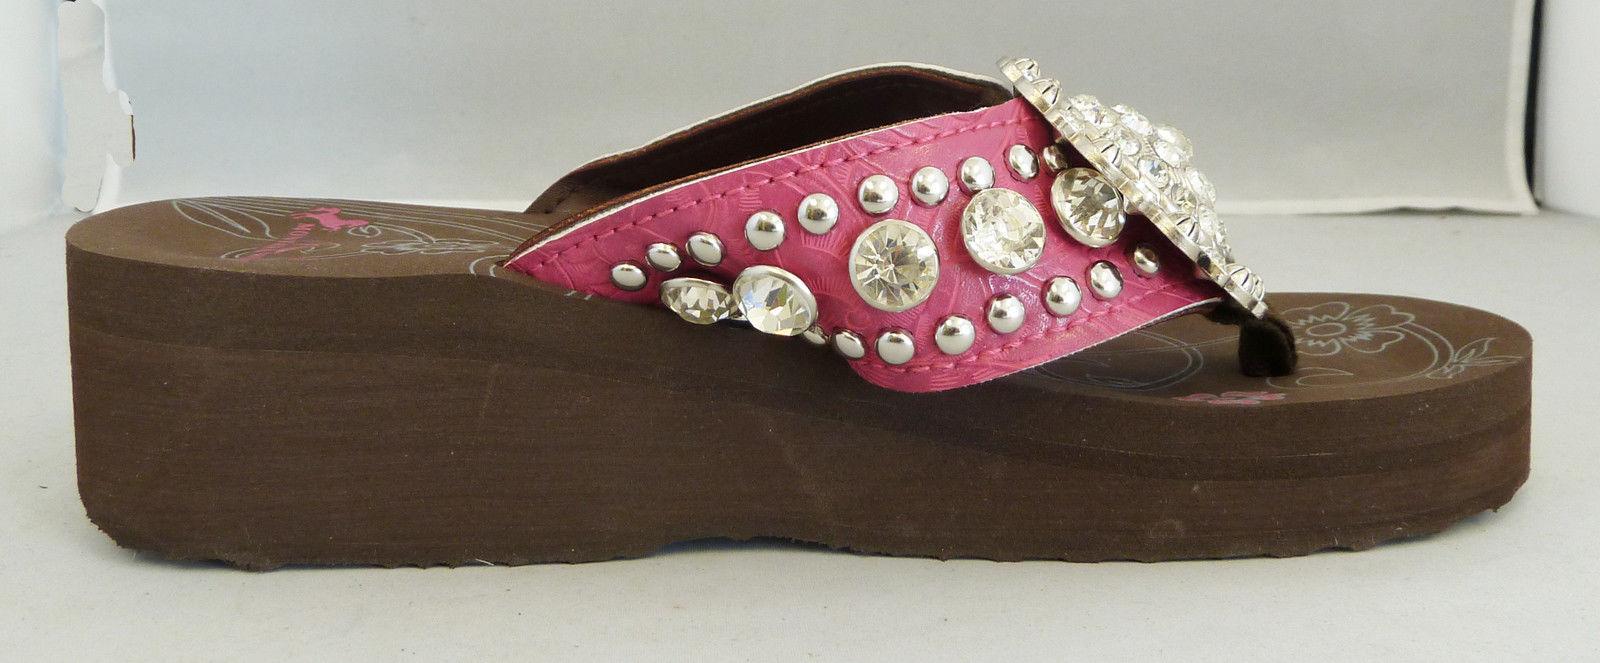 c3aaa8b32b22 Montana West Women Flip Flops Wedged Bling Sandals Large Floral ...